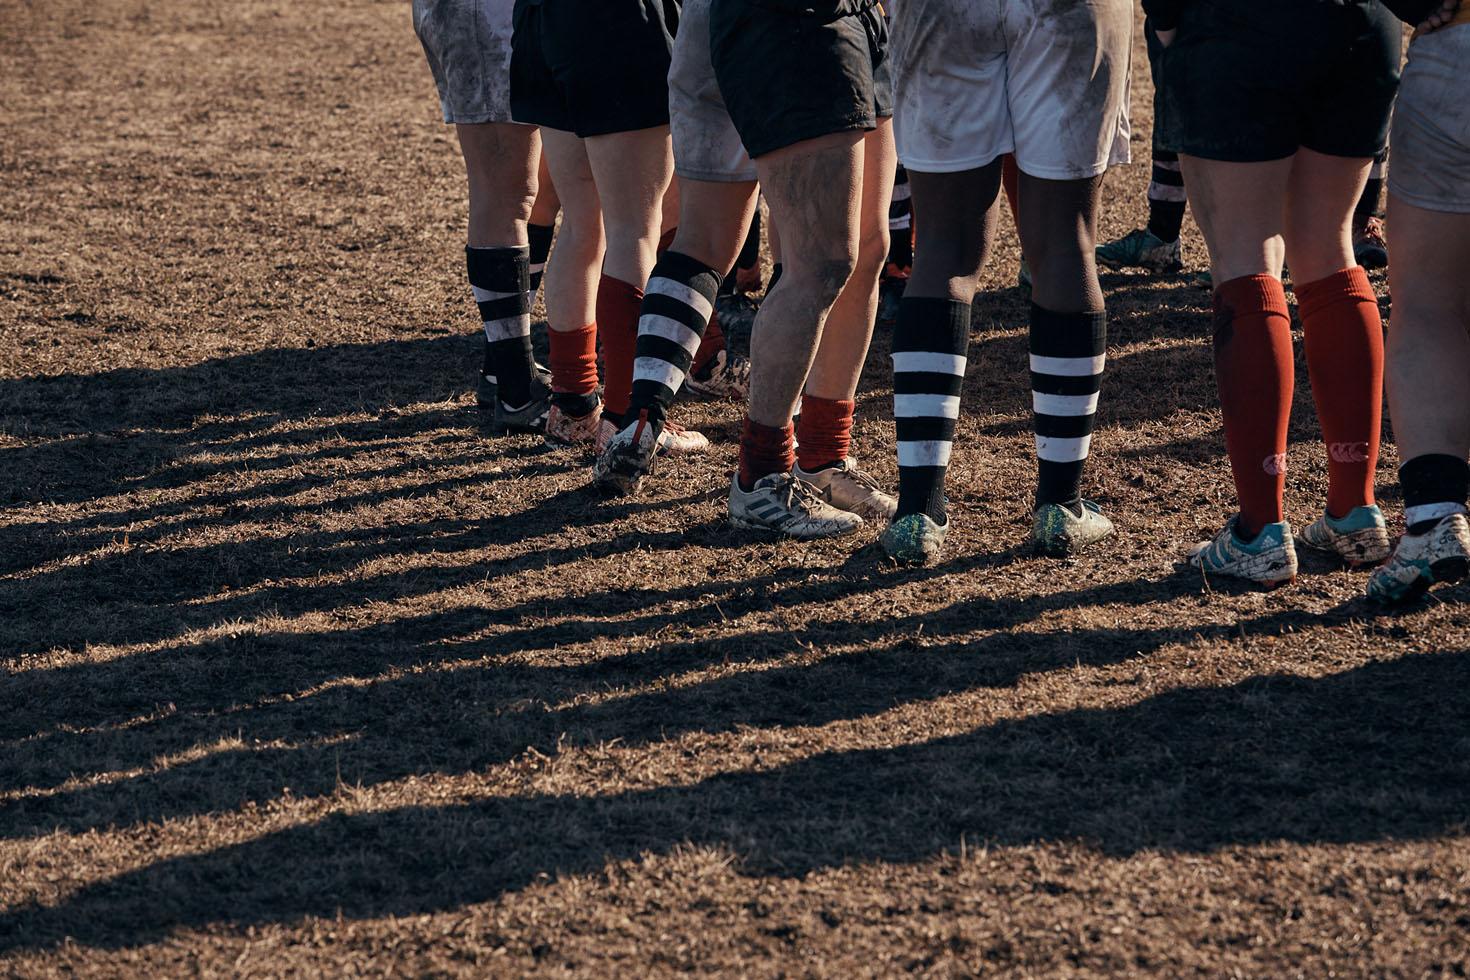 Rugby_1719_Web.jpg